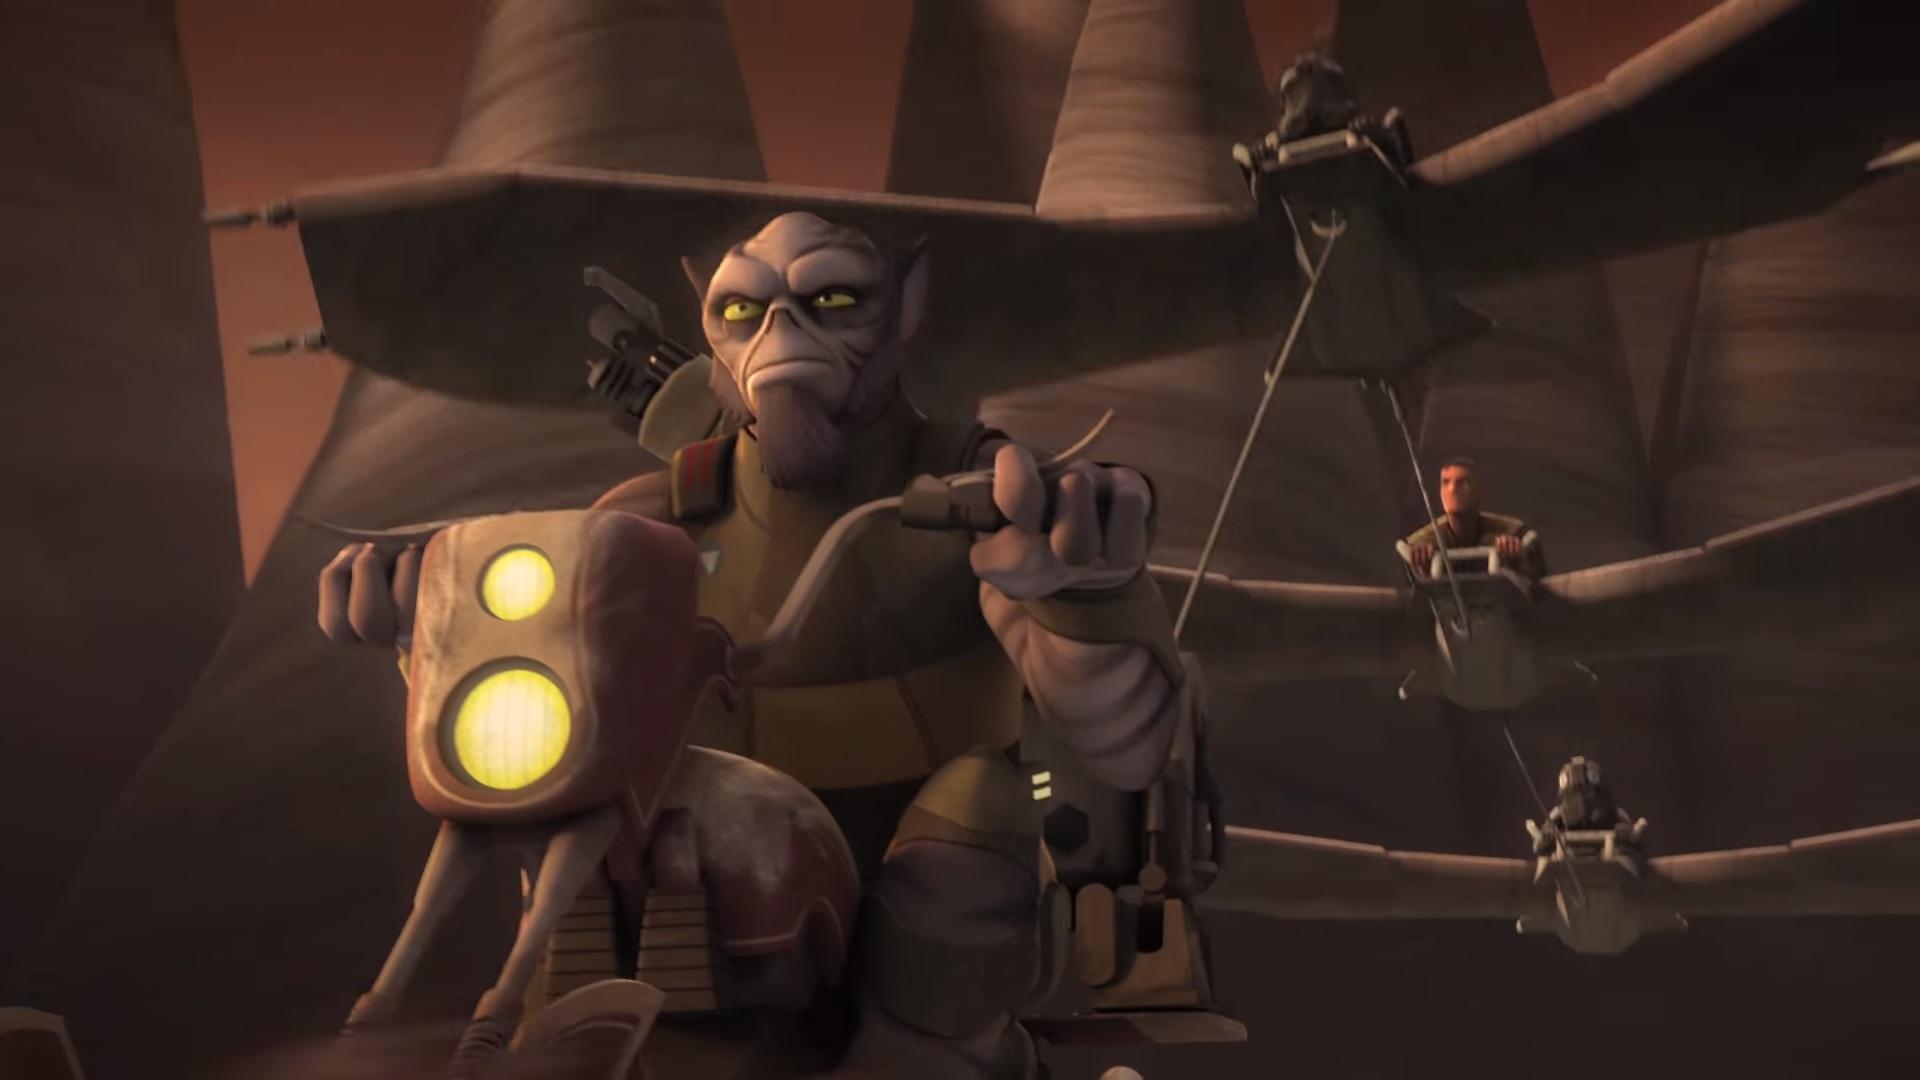 Rpggamer Org Review Star Wars Rebels Season 4 Episode 10 Jedi Night